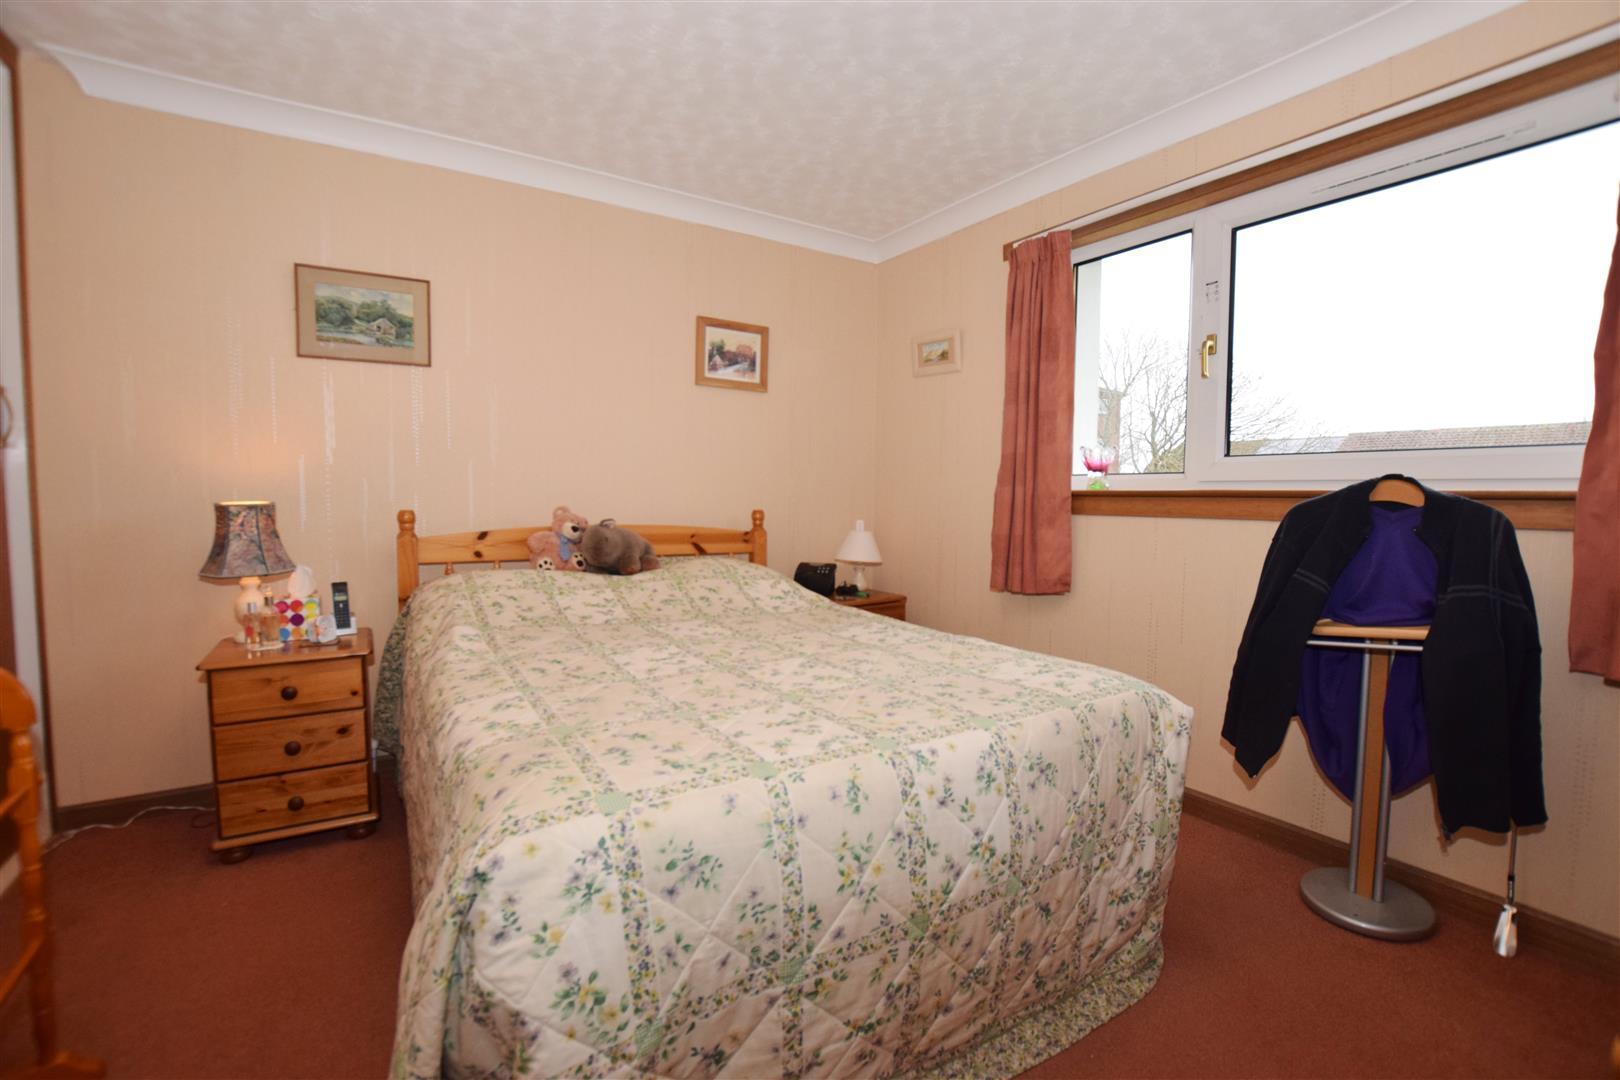 41, Eriskay Place, Perth, Perthshire, PH1 3DH, UK